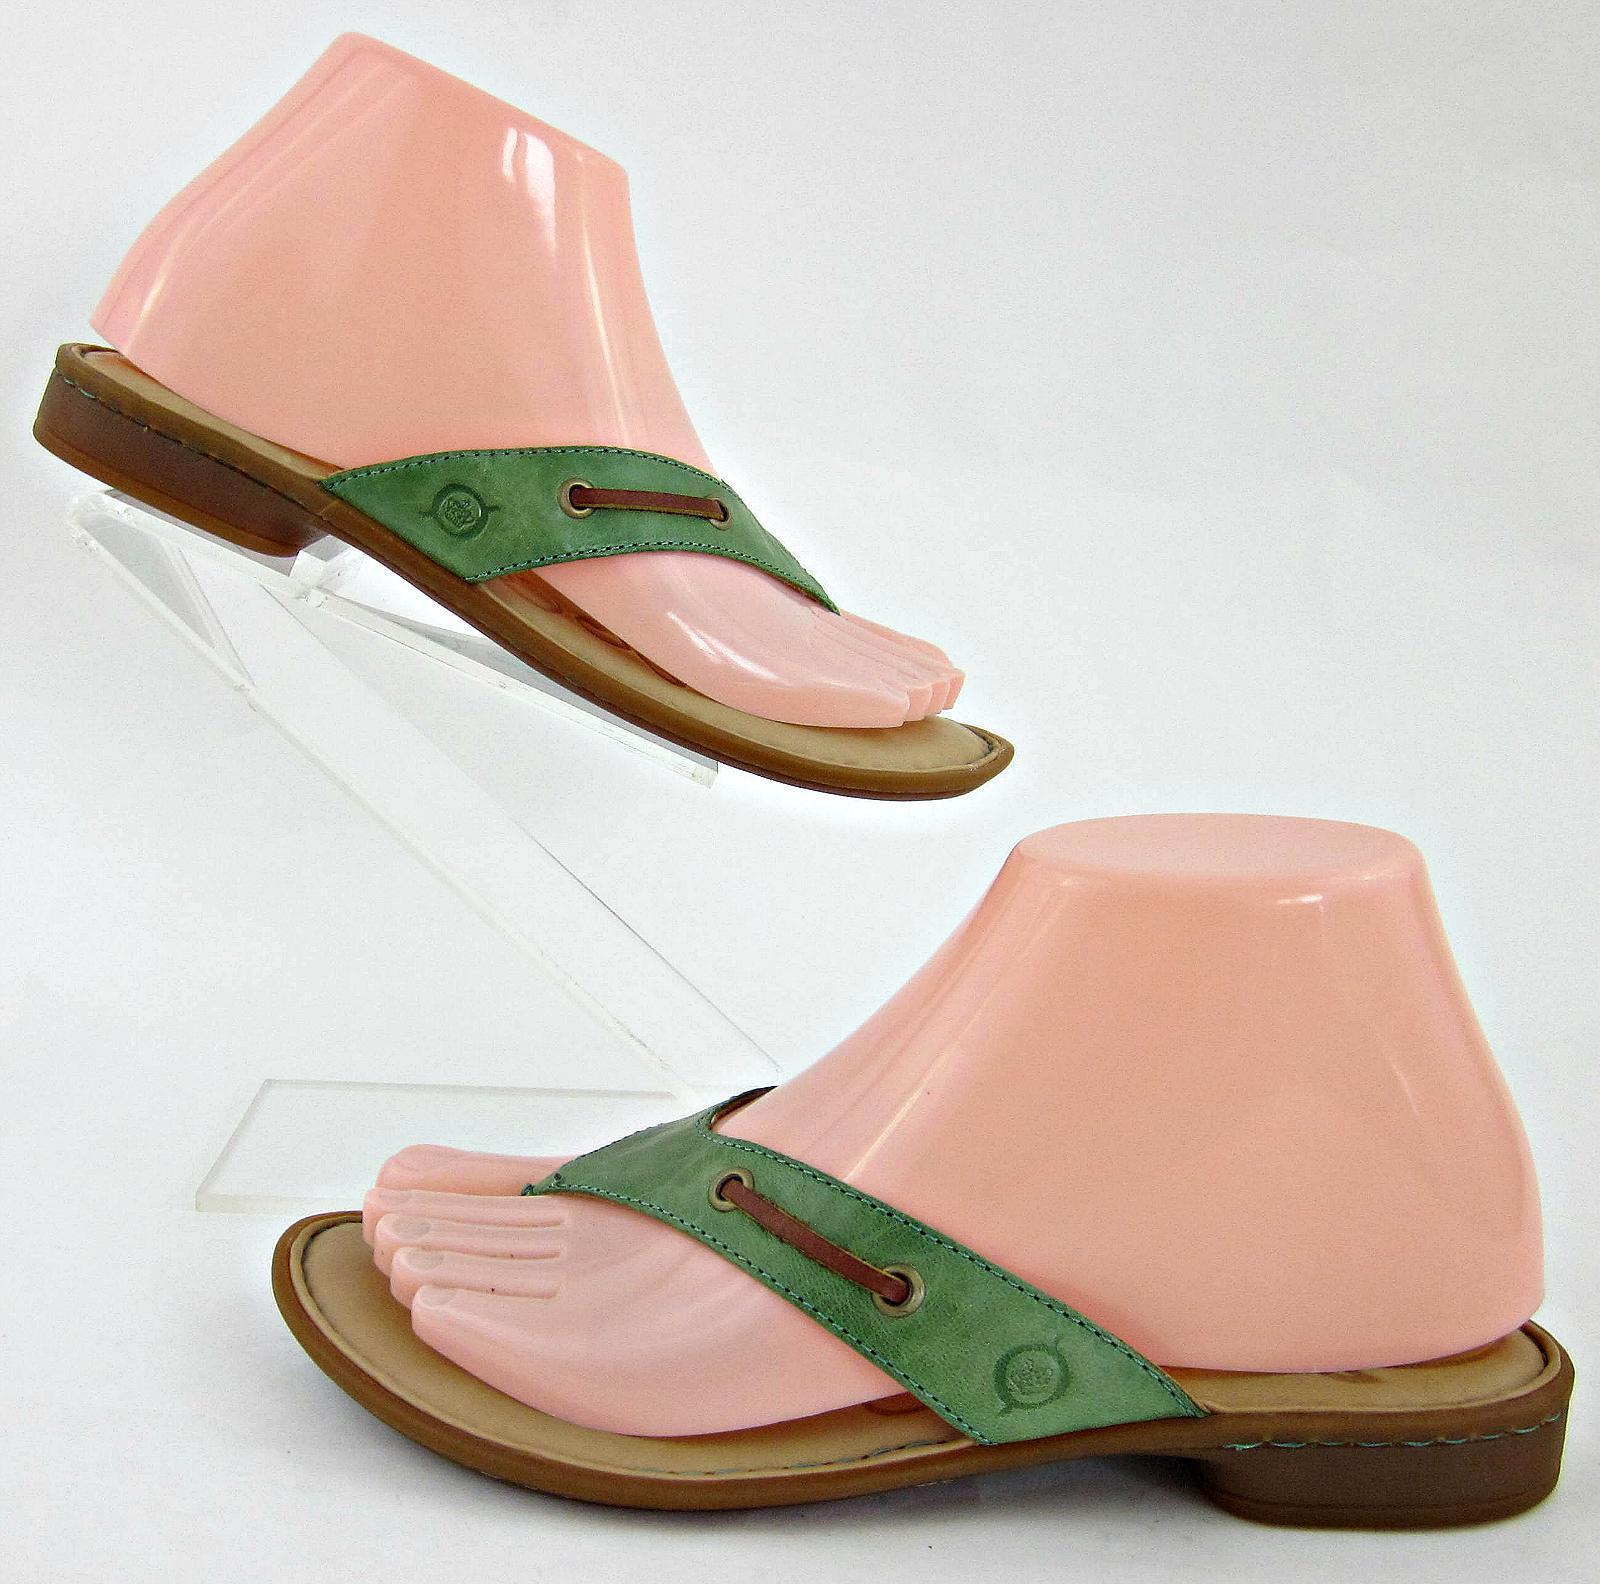 Born 'Toya' Thong Sandales Green Tan Leder Sz 6 Worn Once